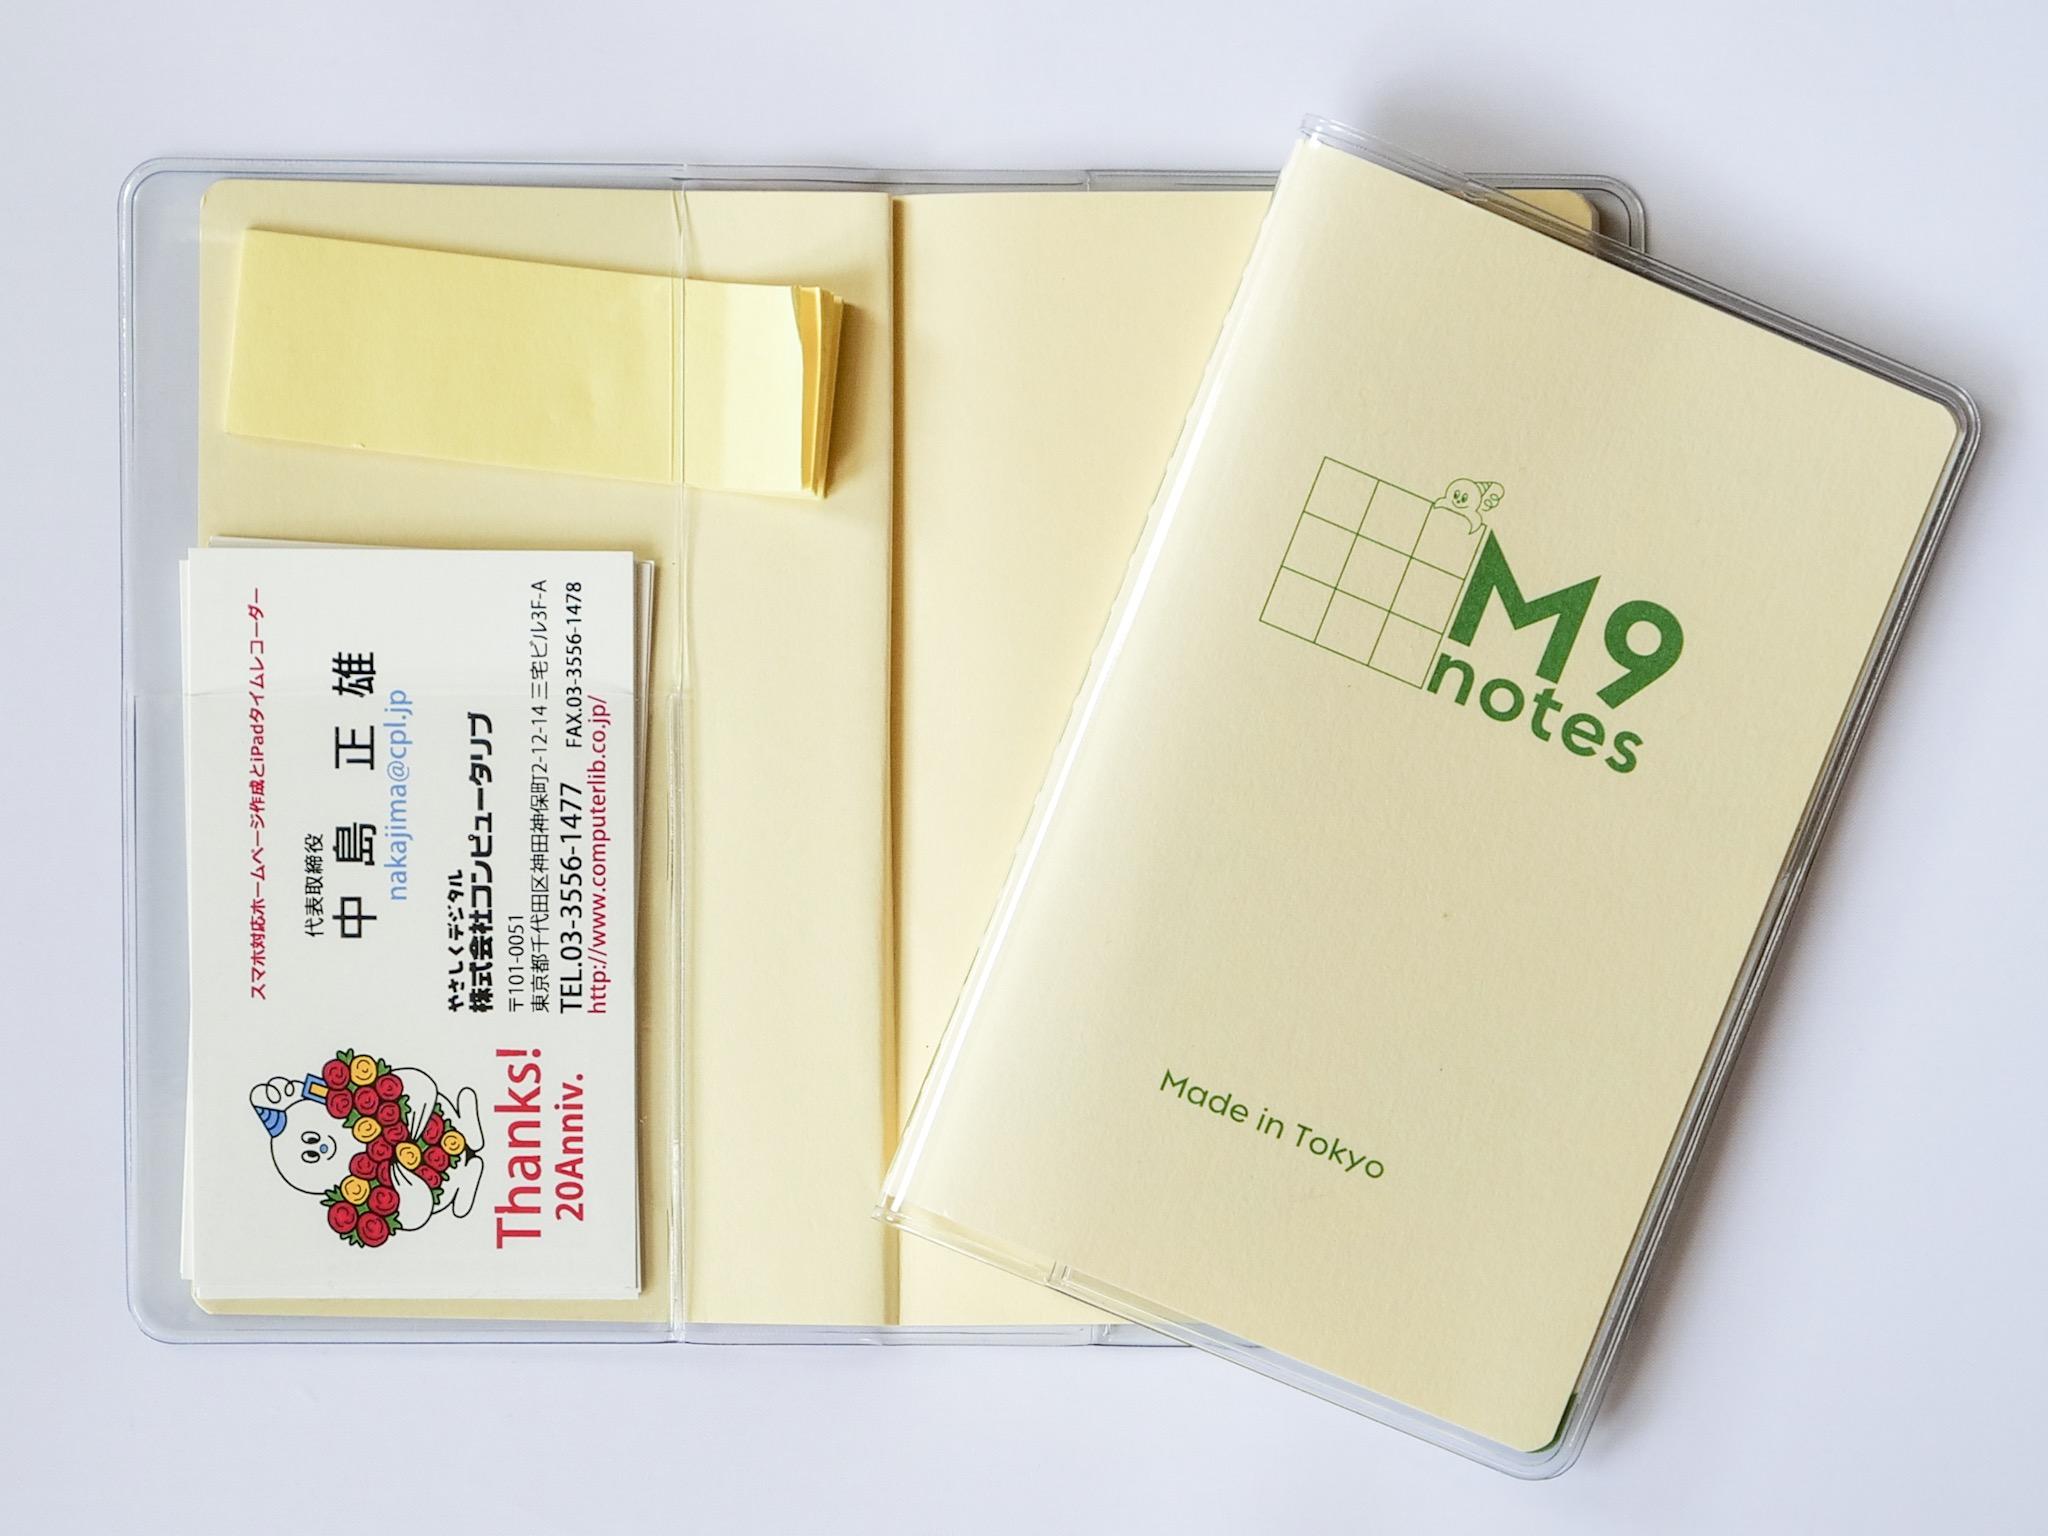 M9notes専用手帳カバー試作品ができました。